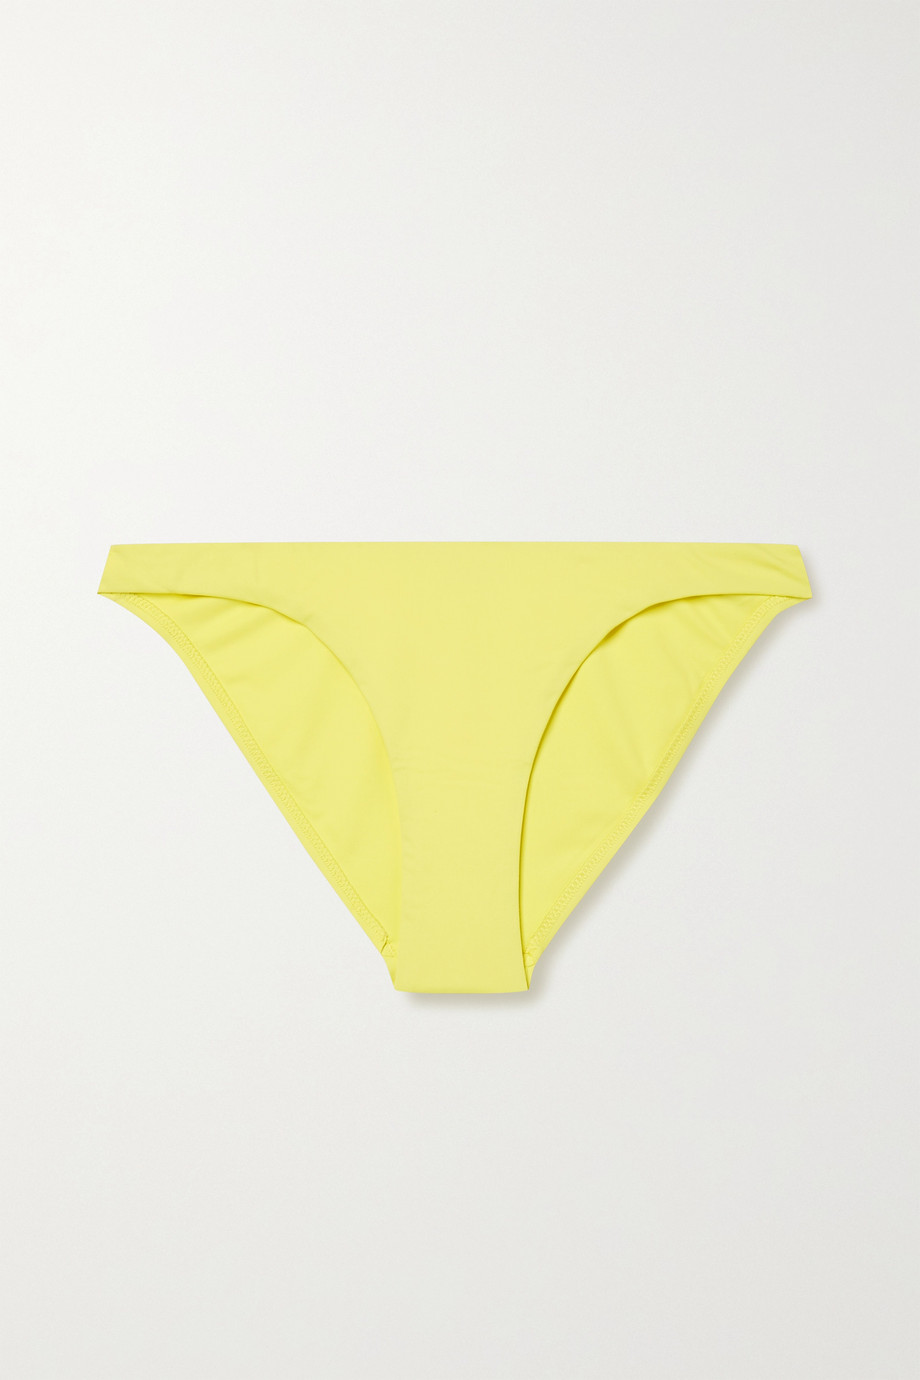 Melissa Odabash Cayman bikini briefs